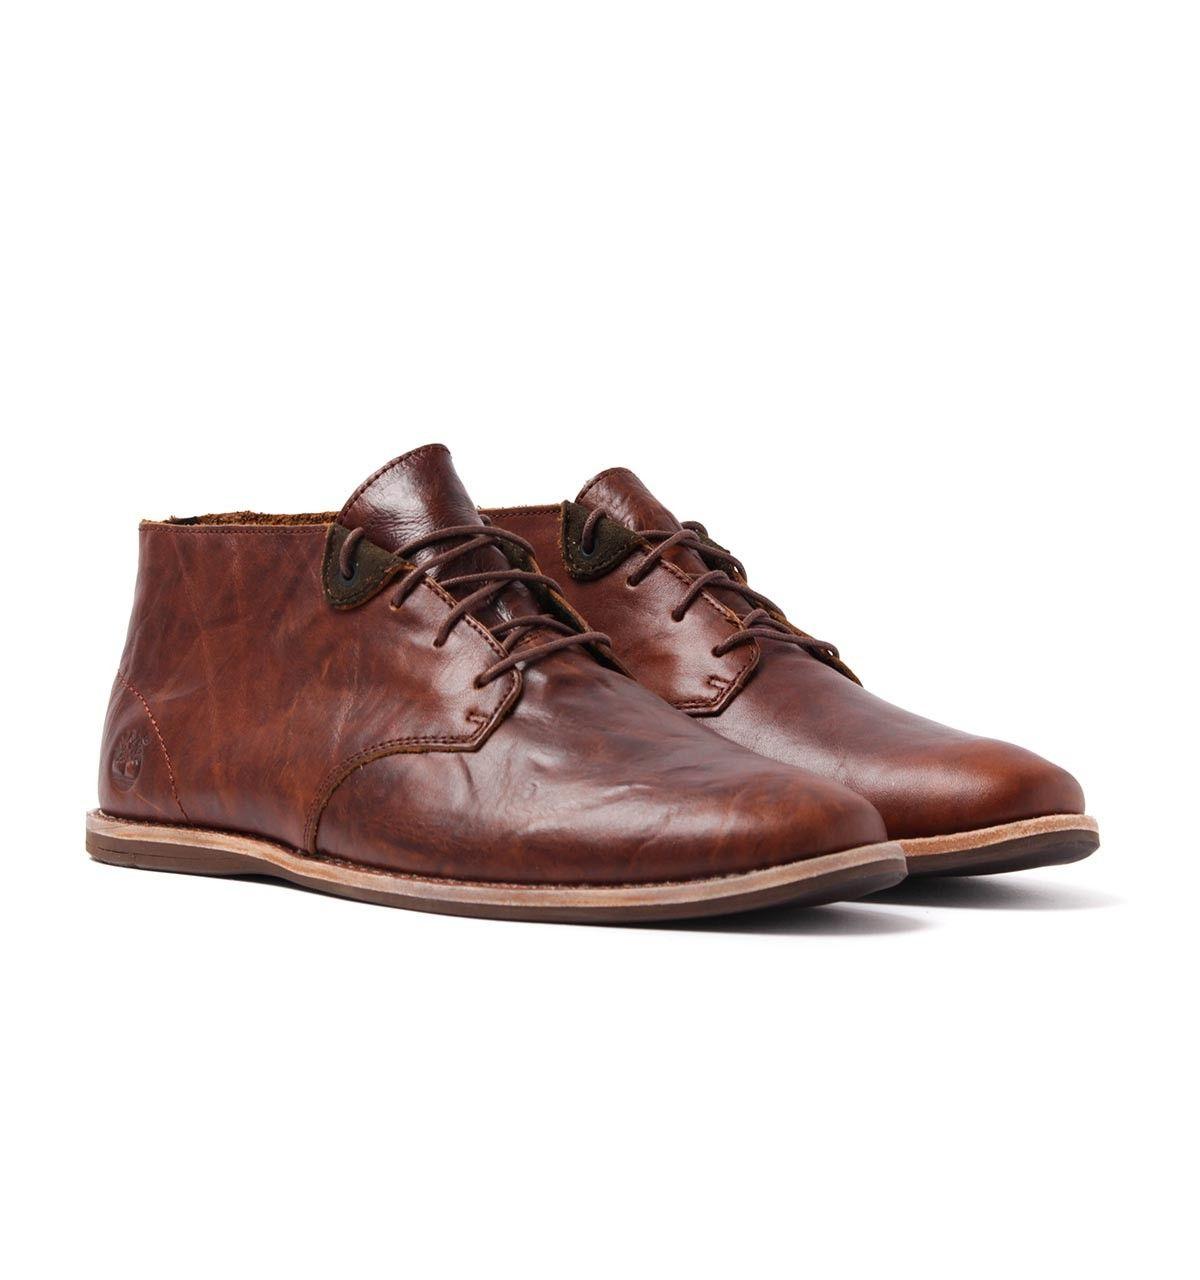 Timberland Revenia Dark Sudan Brown Leather Chukka Boots